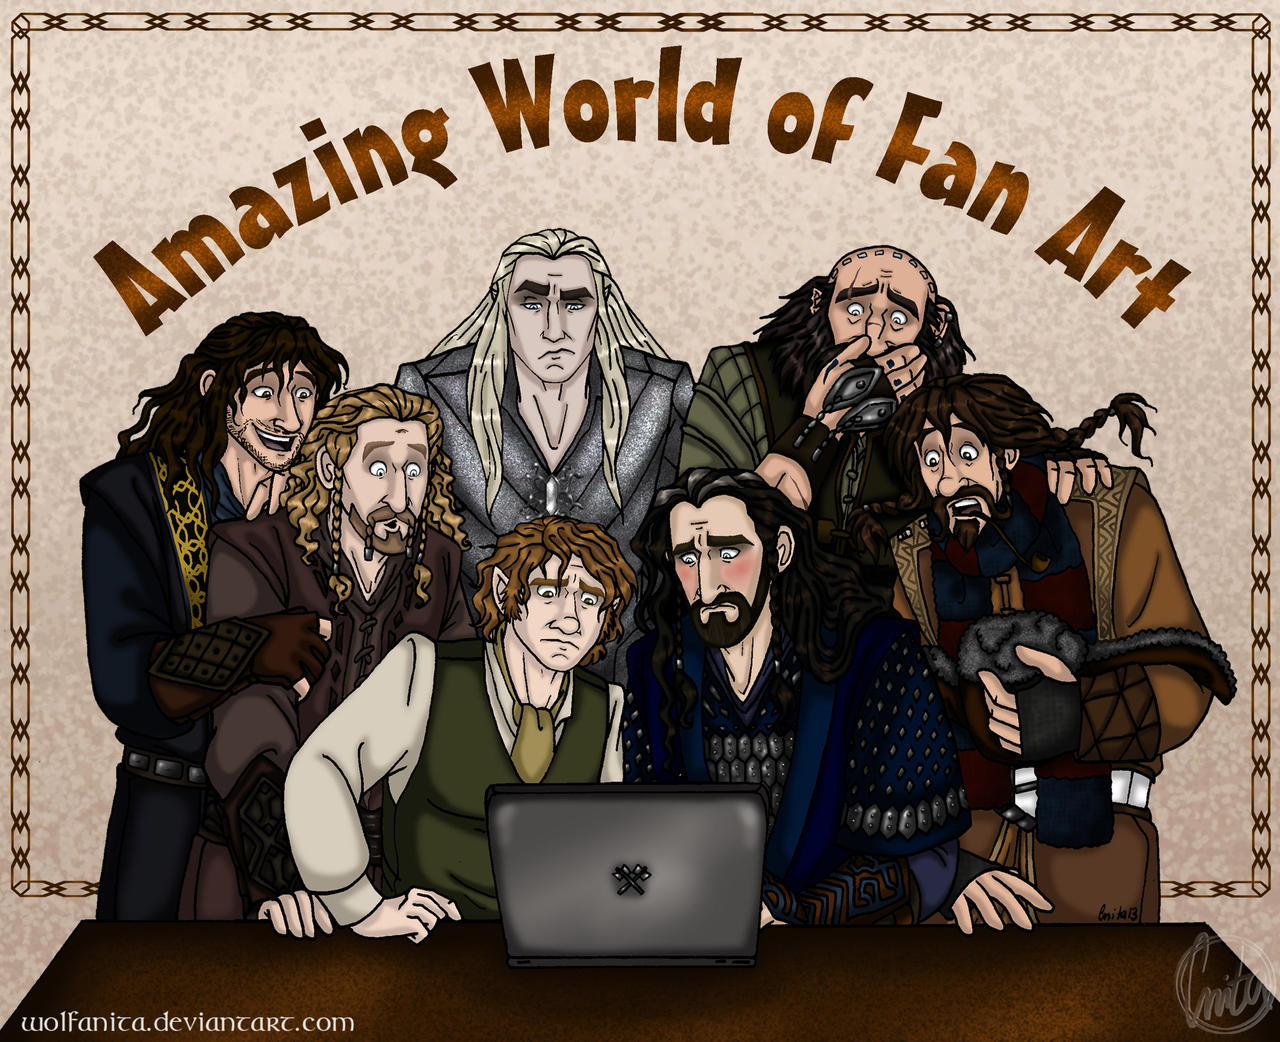 The Hobbit: Amazing World of Fan Art by wolfanita